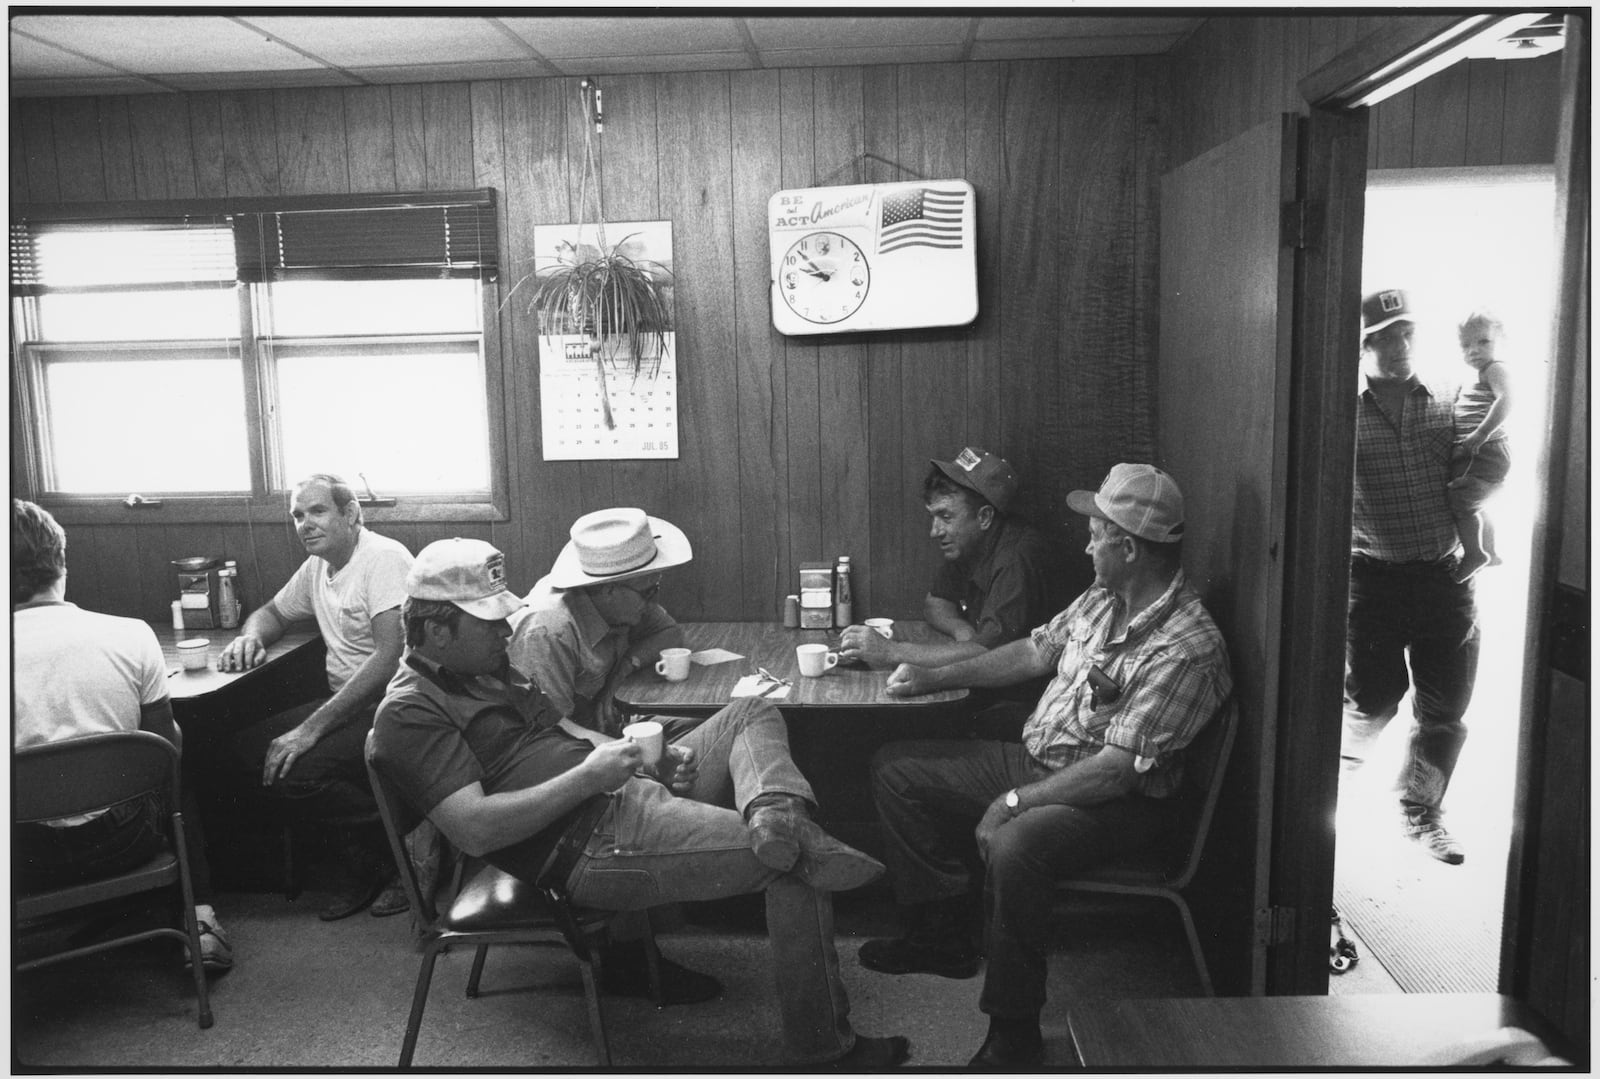 Tom Arndt, Coffee Shop, Auction Barn, Sleepy eye, Minnesota, 1985